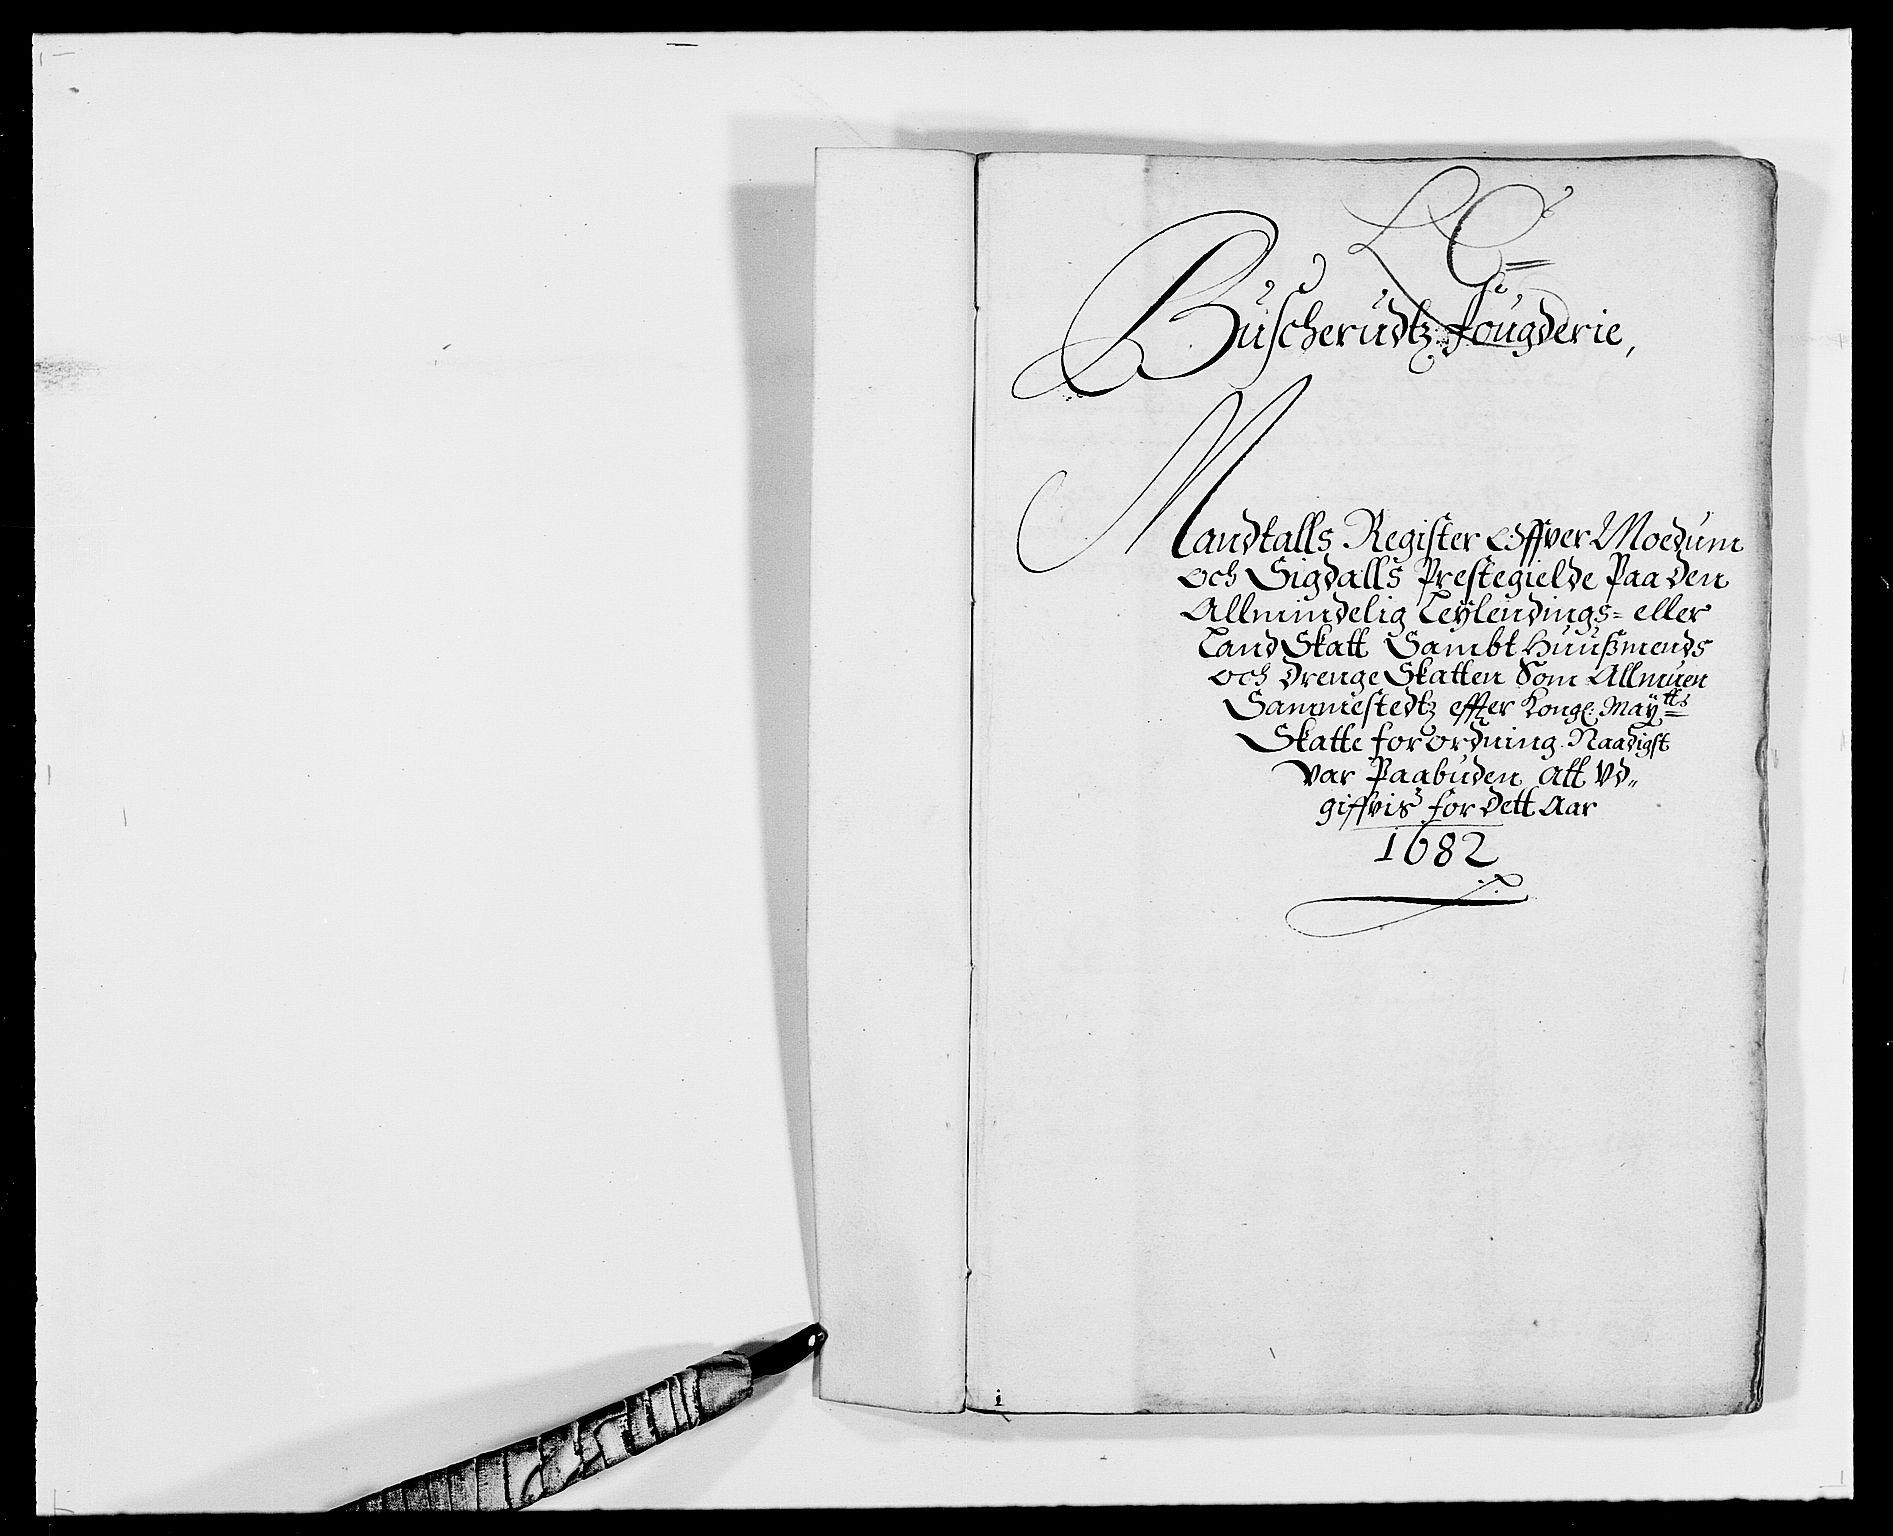 RA, Rentekammeret inntil 1814, Reviderte regnskaper, Fogderegnskap, R25/L1676: Fogderegnskap Buskerud, 1682, s. 28